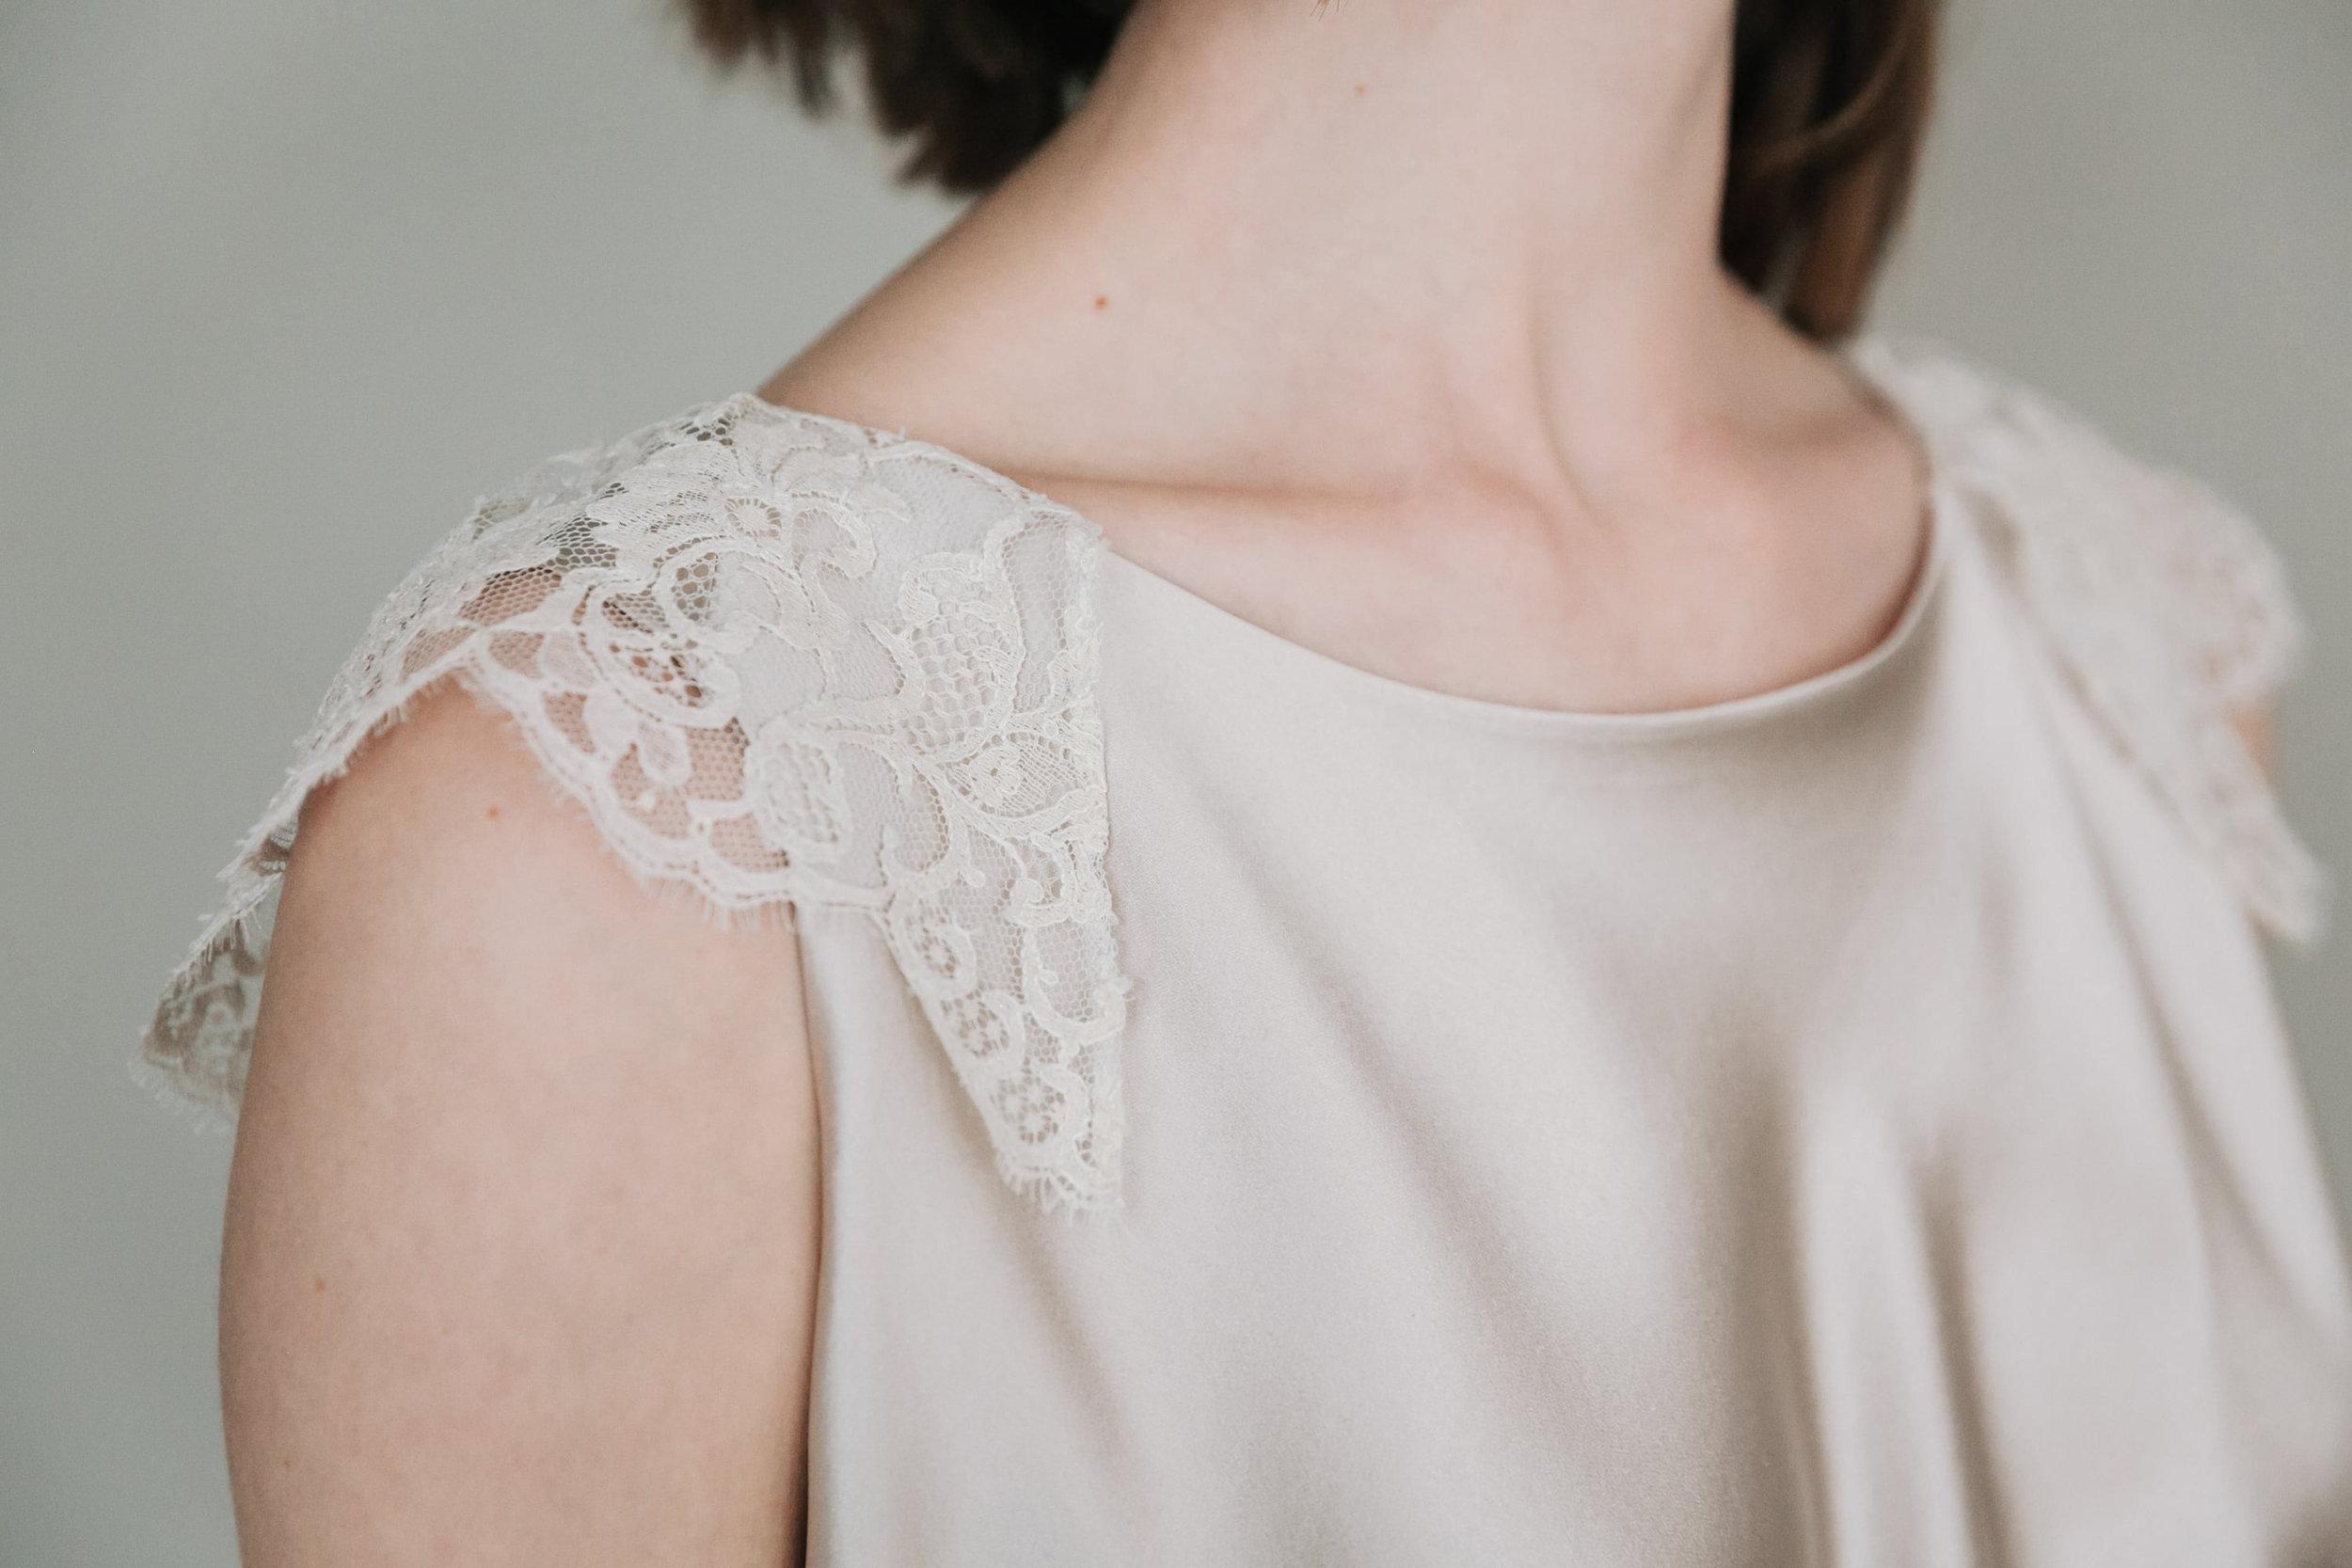 Kate-Beaumont-Sheffield-Honeysuckle-Bias-Cut-Silk-Panelled-Wedding-Gown-10.jpg